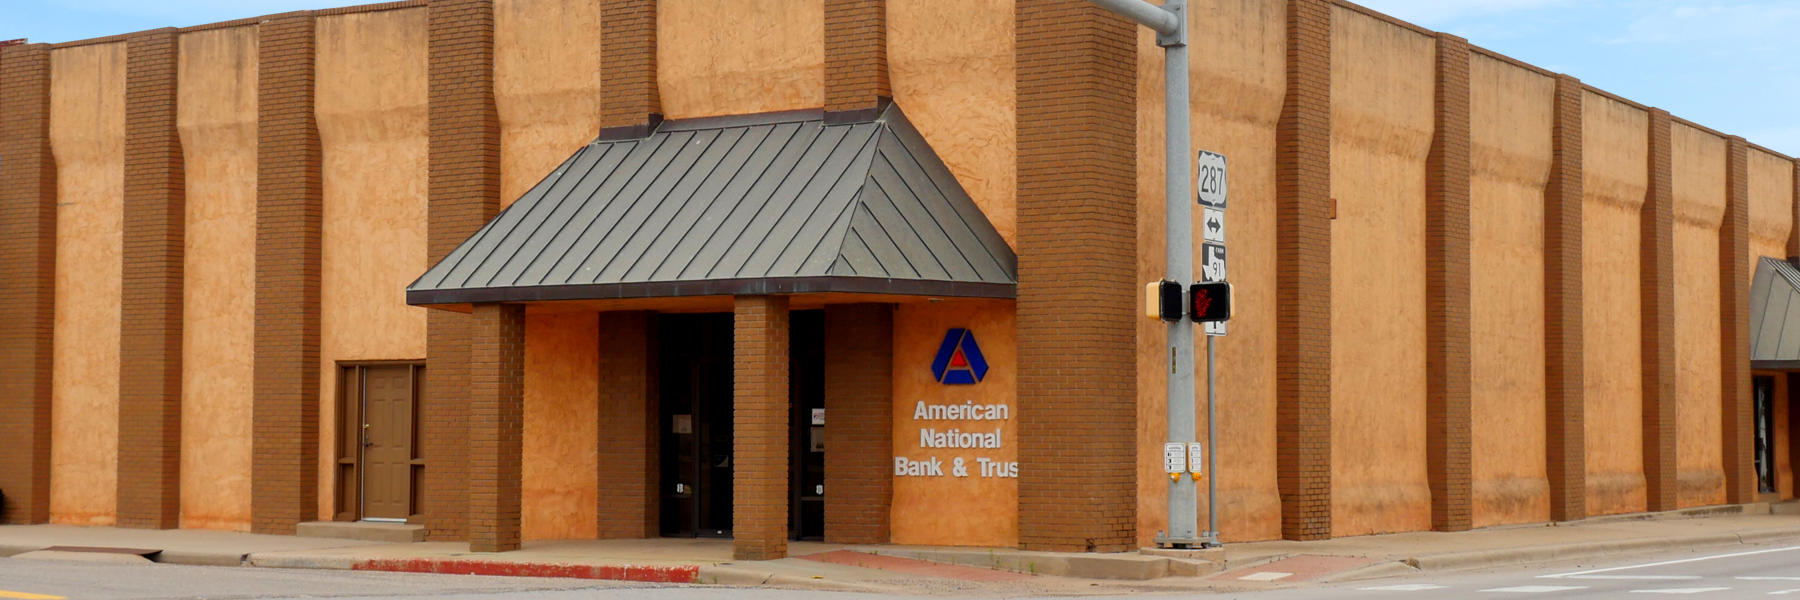 American National Bank & Trust image 0